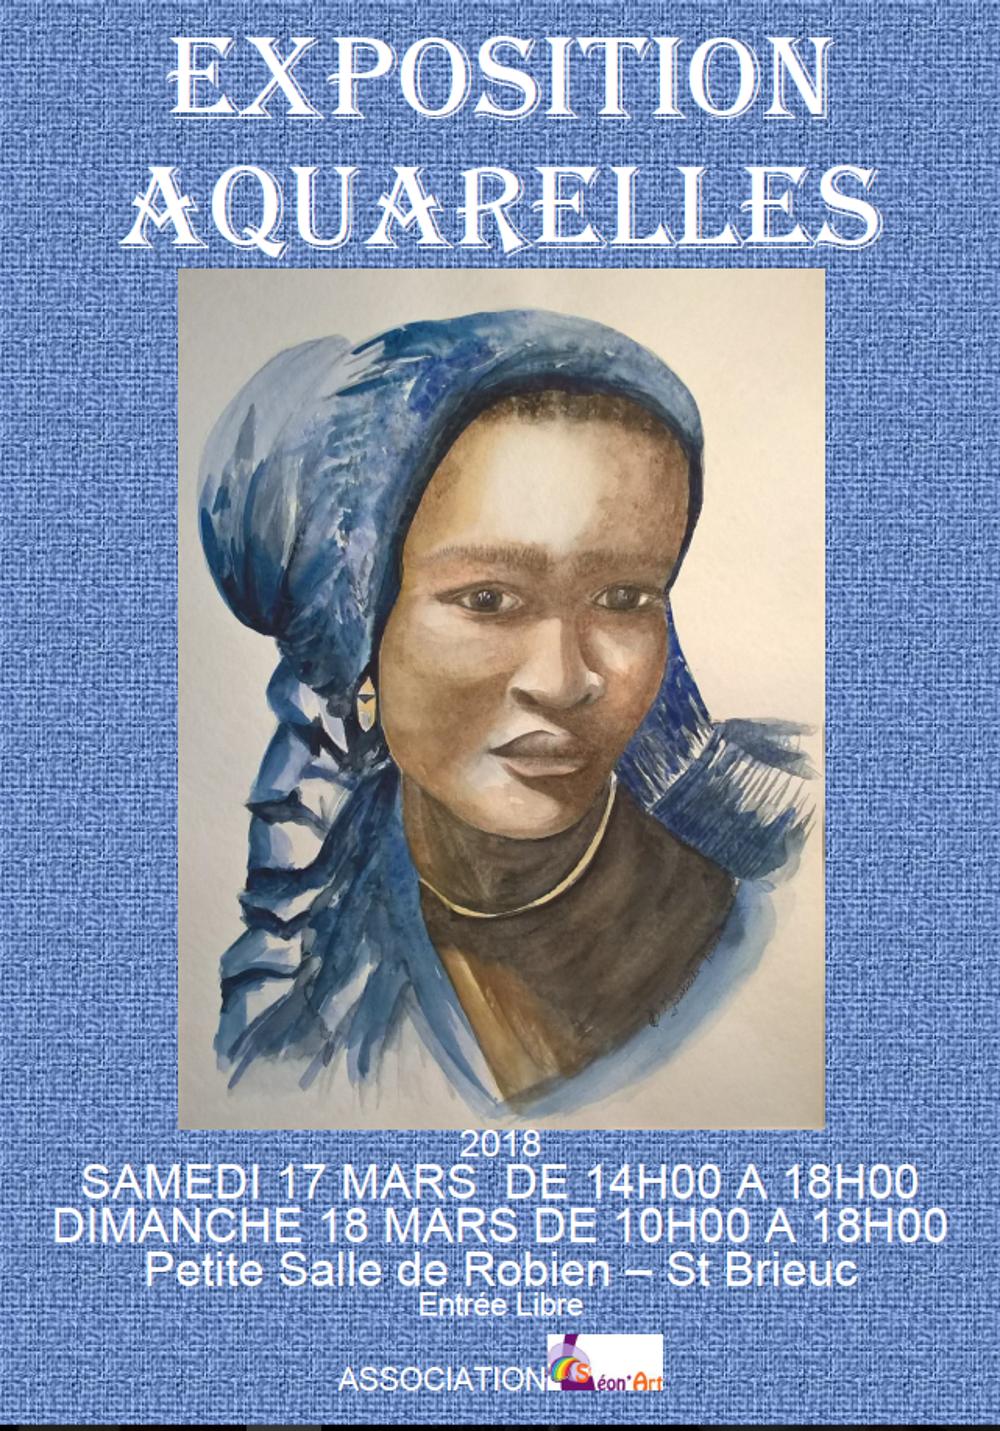 Exposition d''aquarelles 17 et 18 mars 0